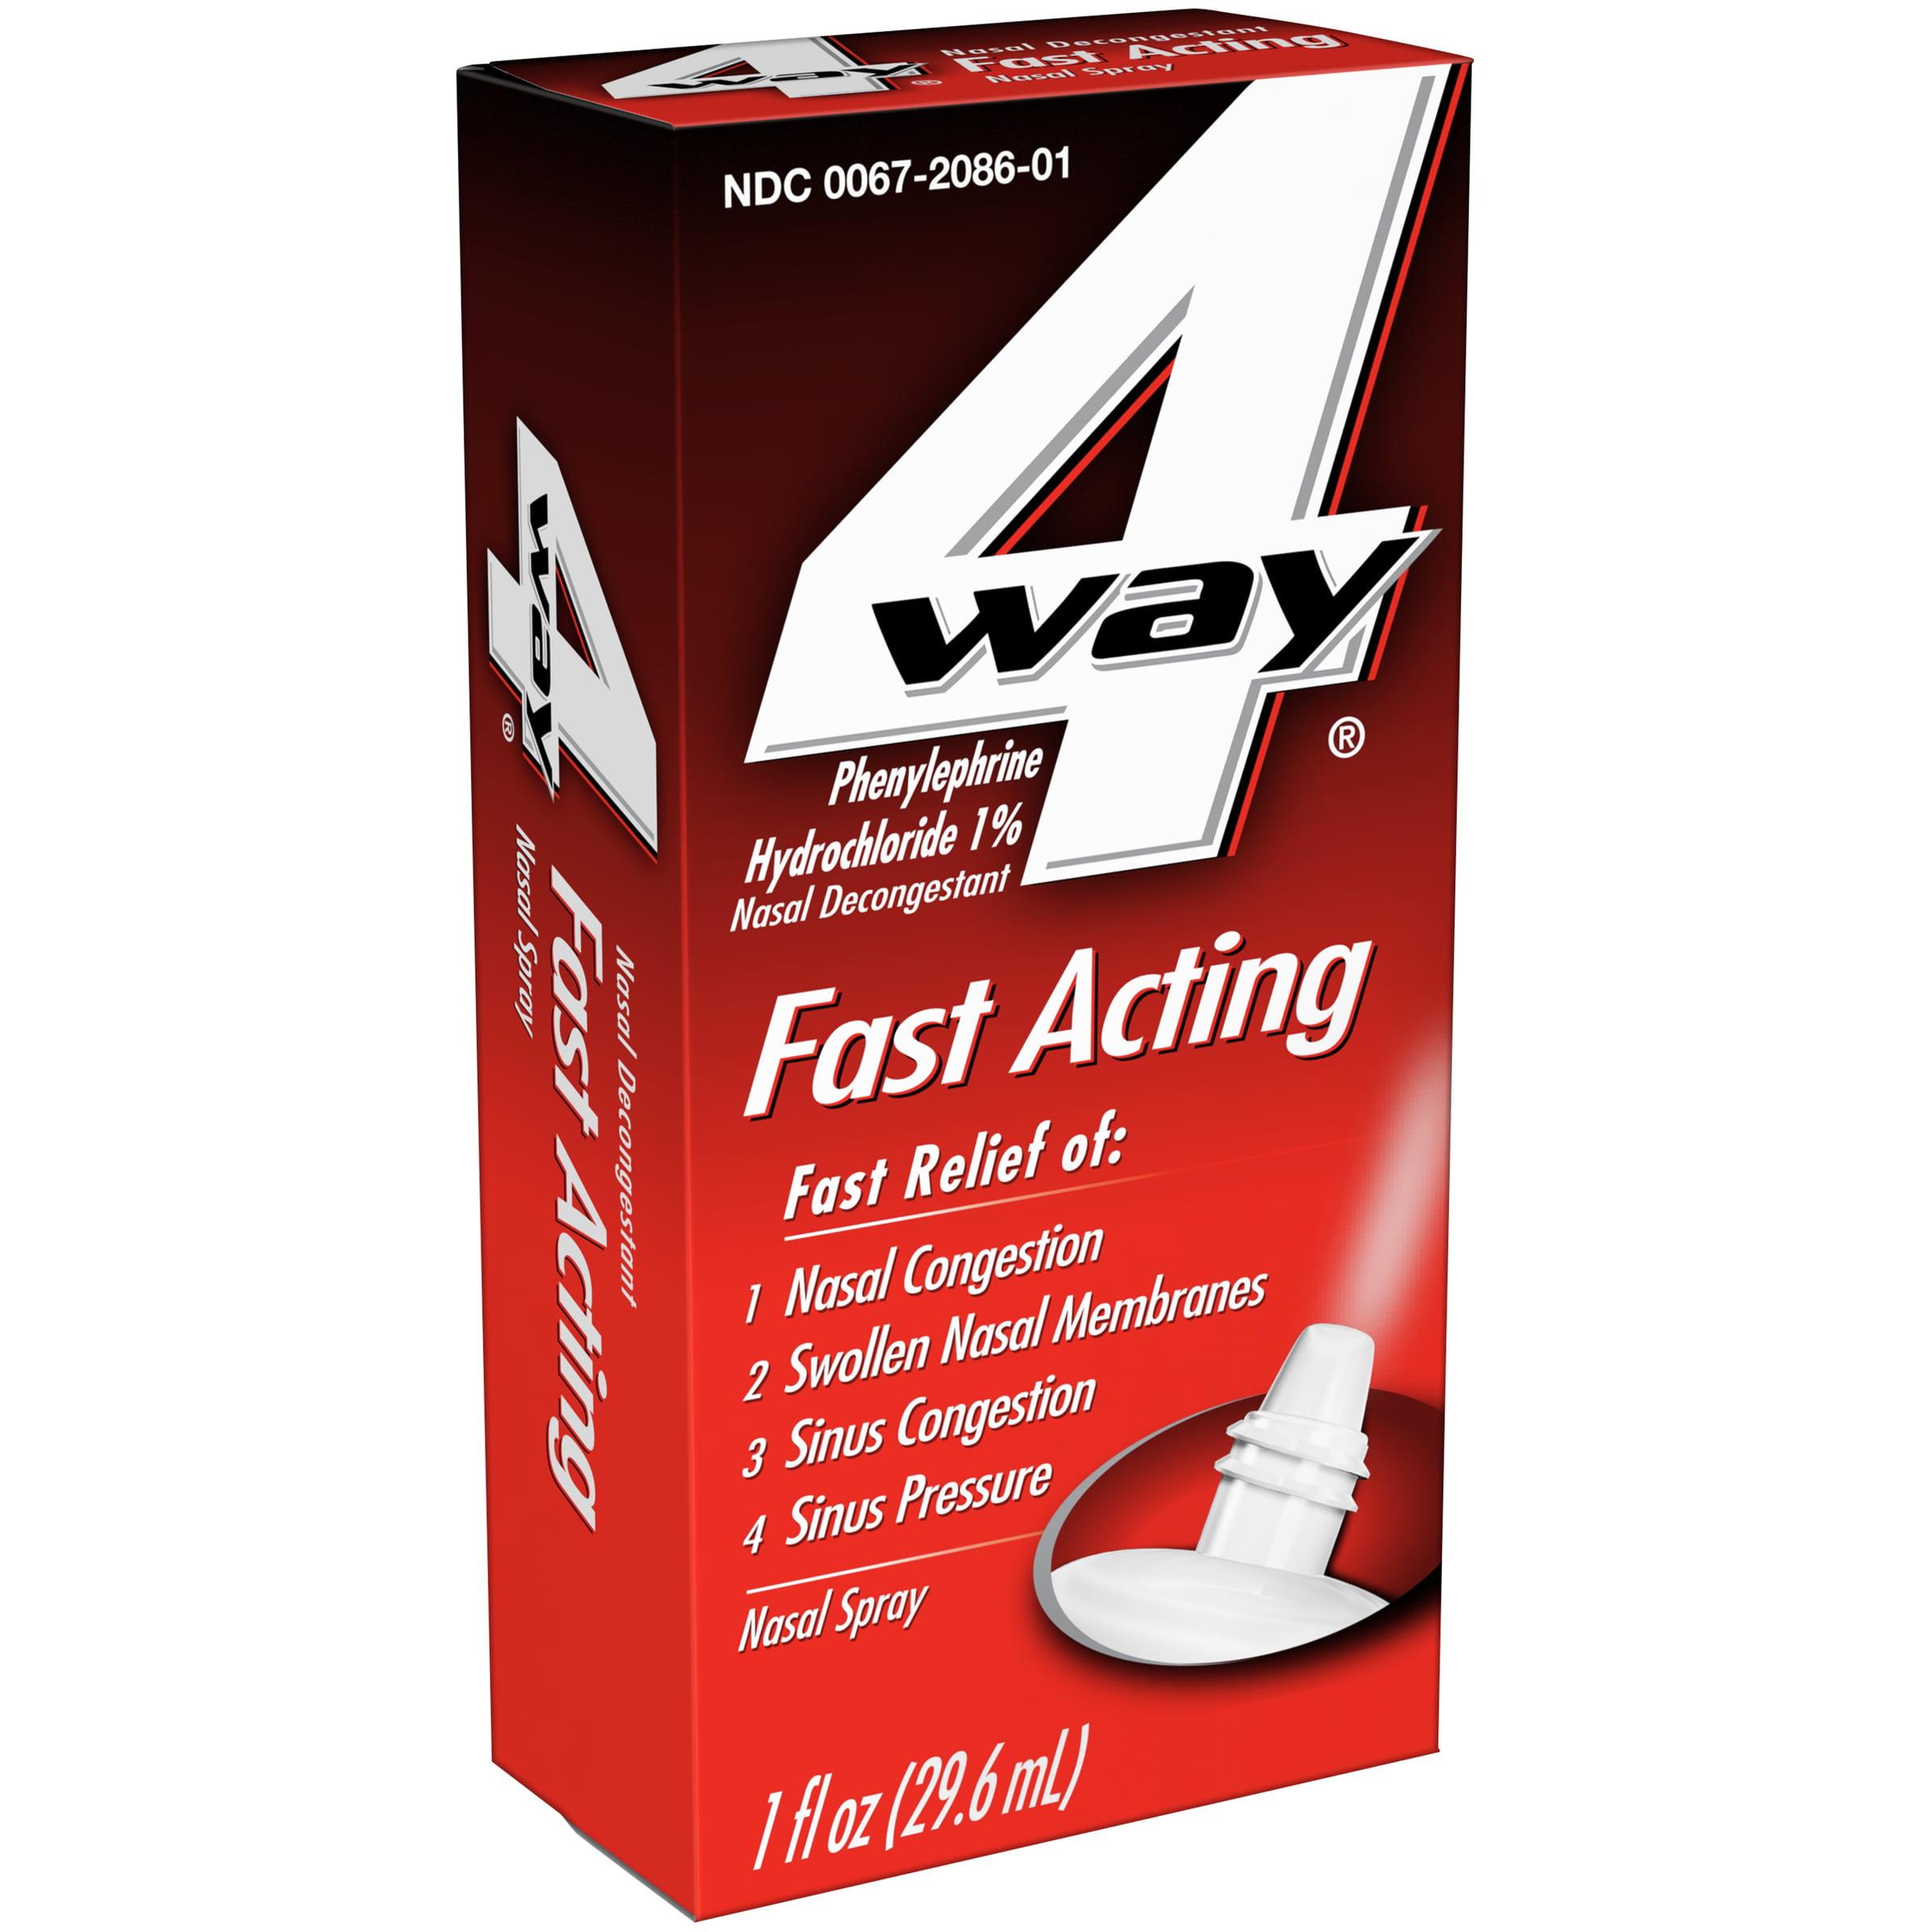 Image of 4 Way ® Fast Acting Nasal Decongestant Nasal Spray 1 fl. oz. Box